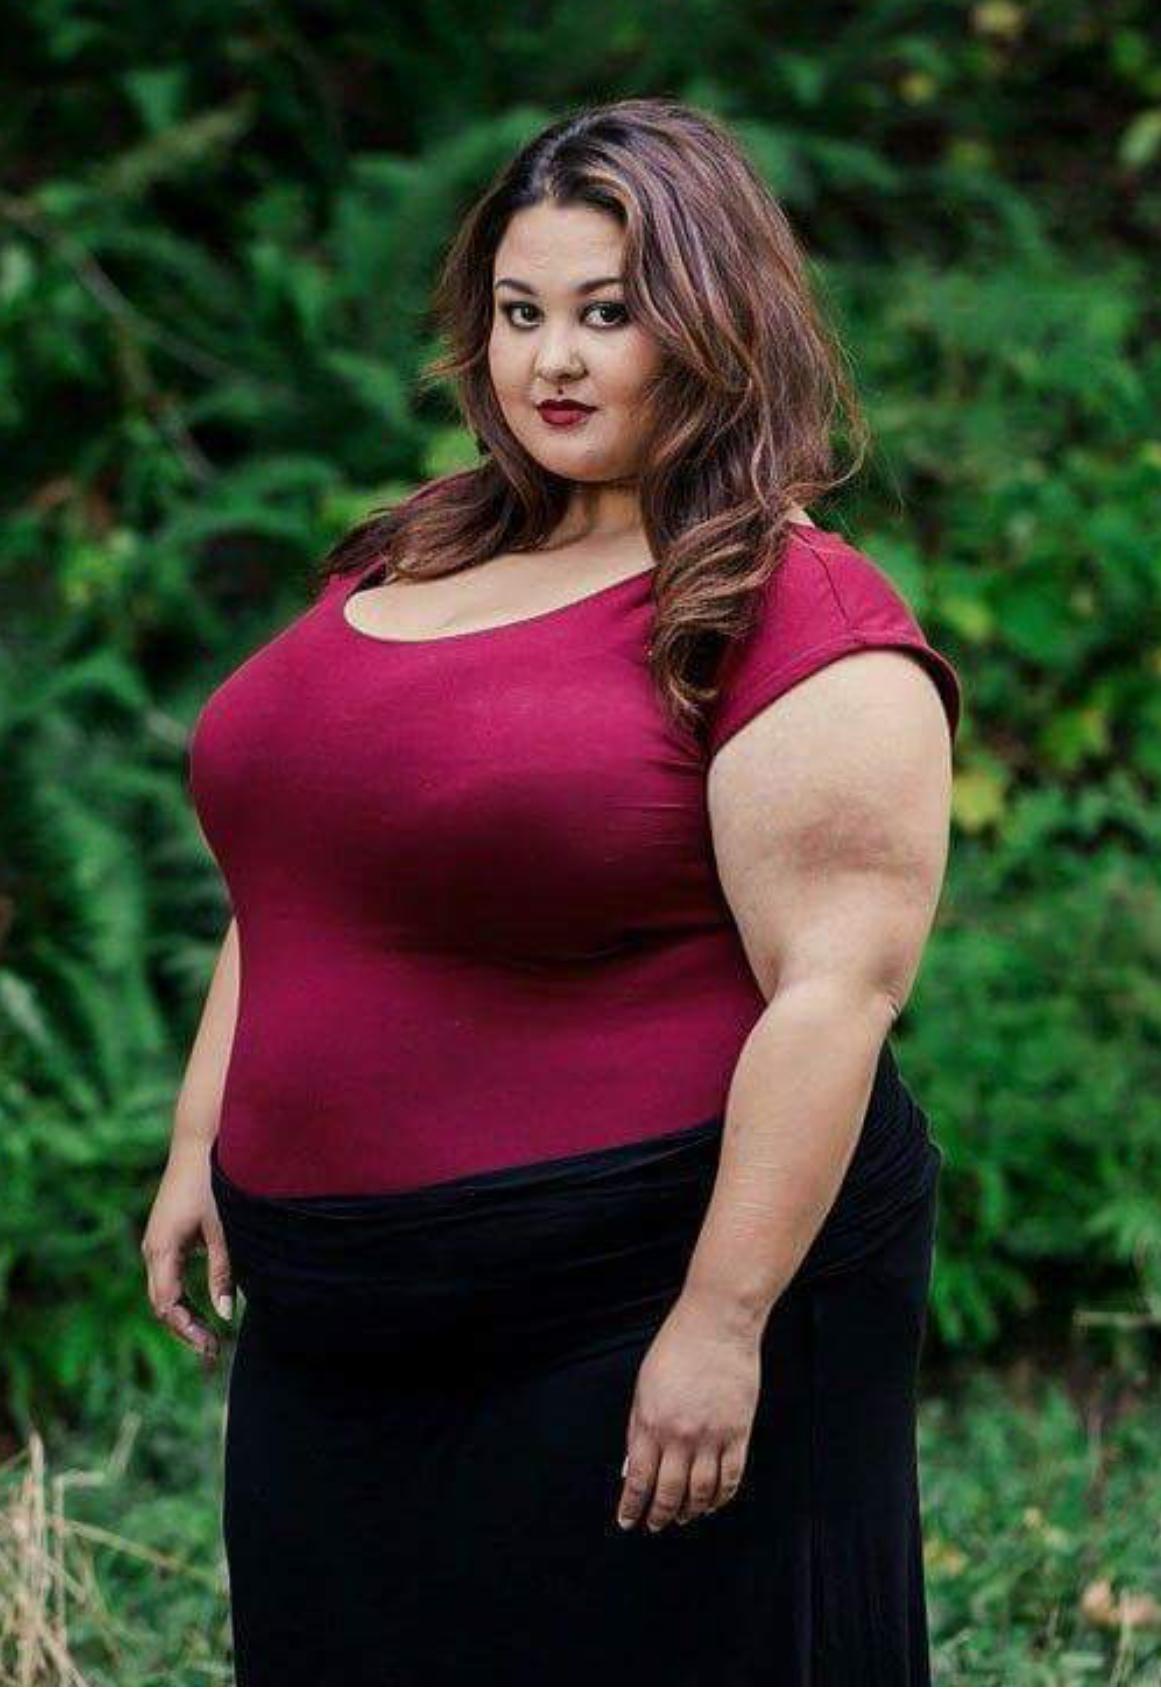 Online dating fat women